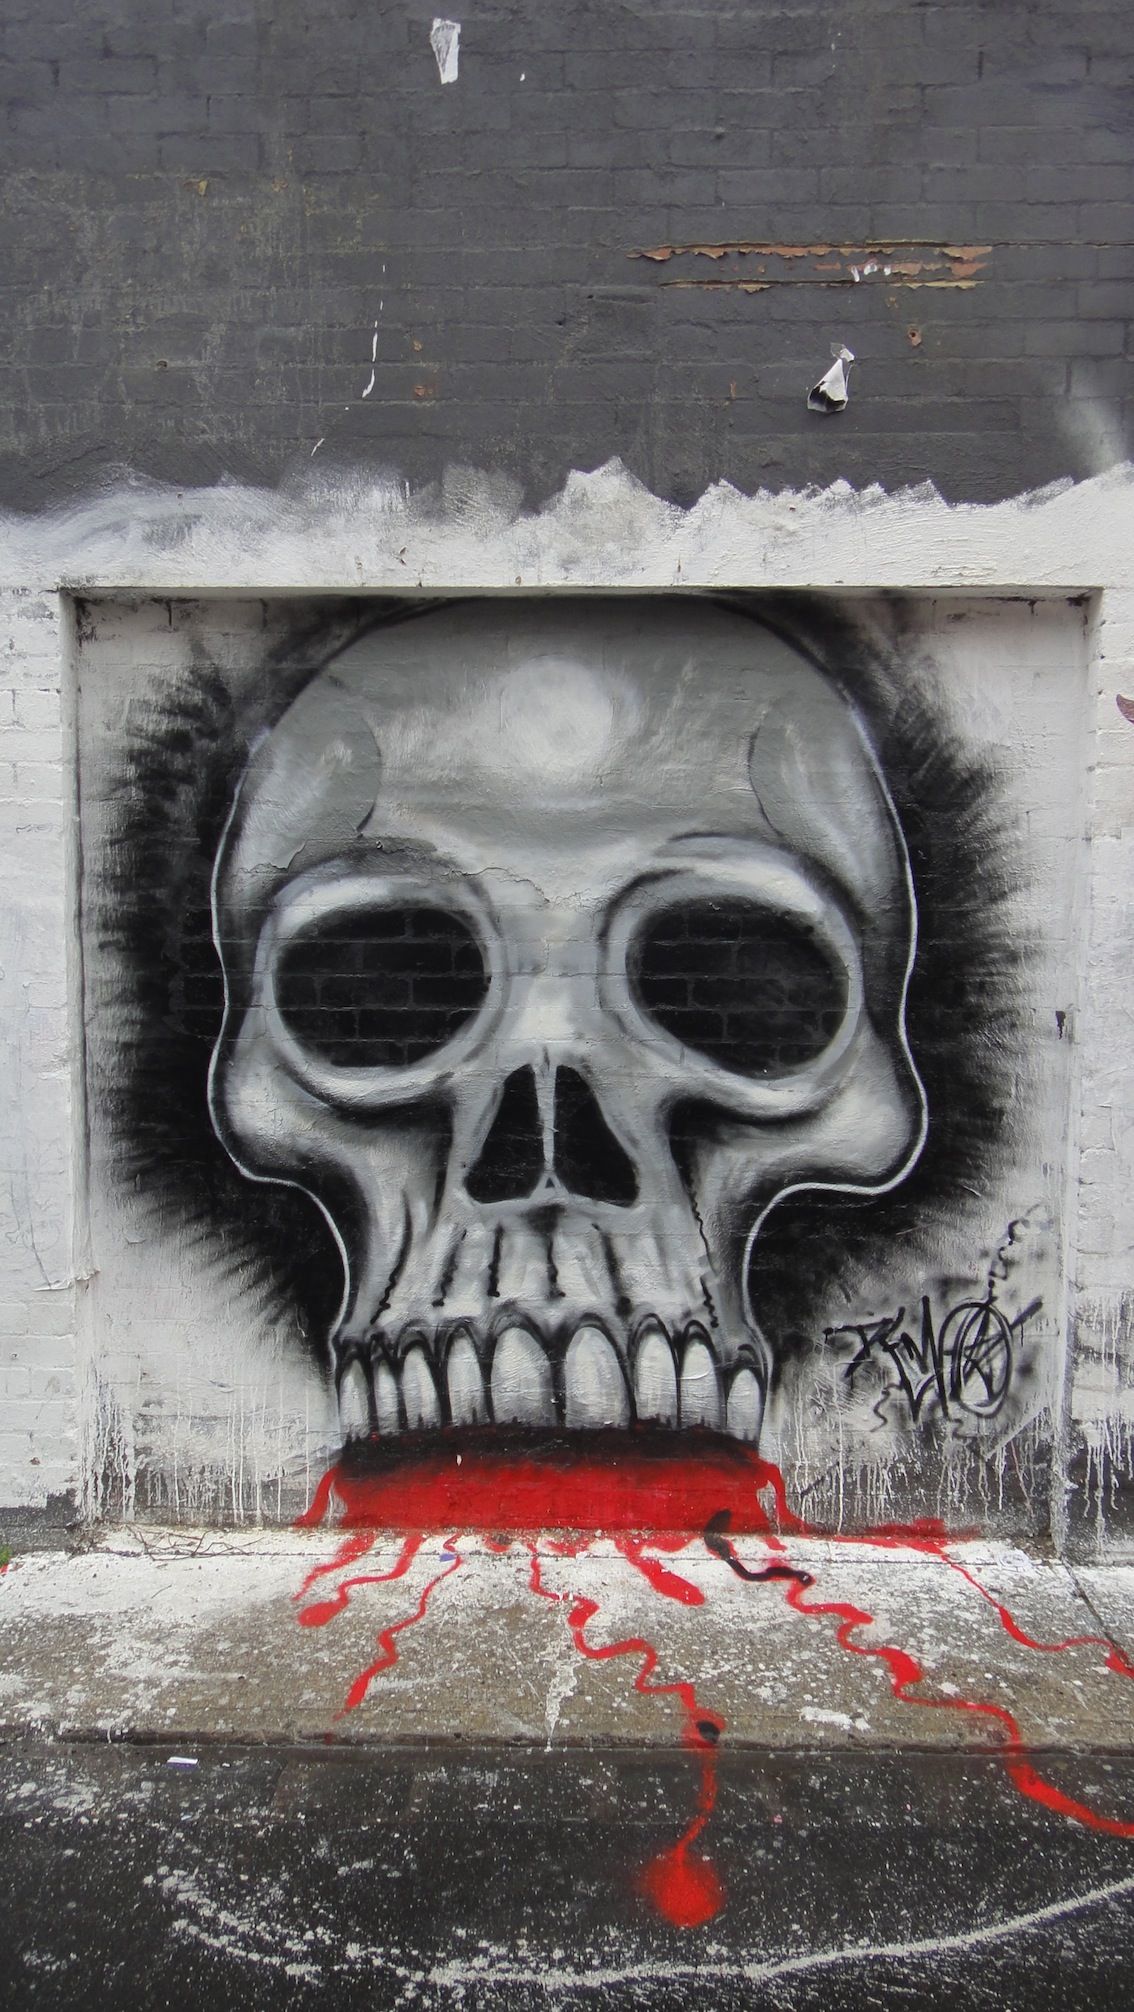 Tagsbrunswick Deansunshine Graffiti Kid Zoom Landofsunshine Melbourne Pasteups Skulls Stencils Streetart Unwell Bunny